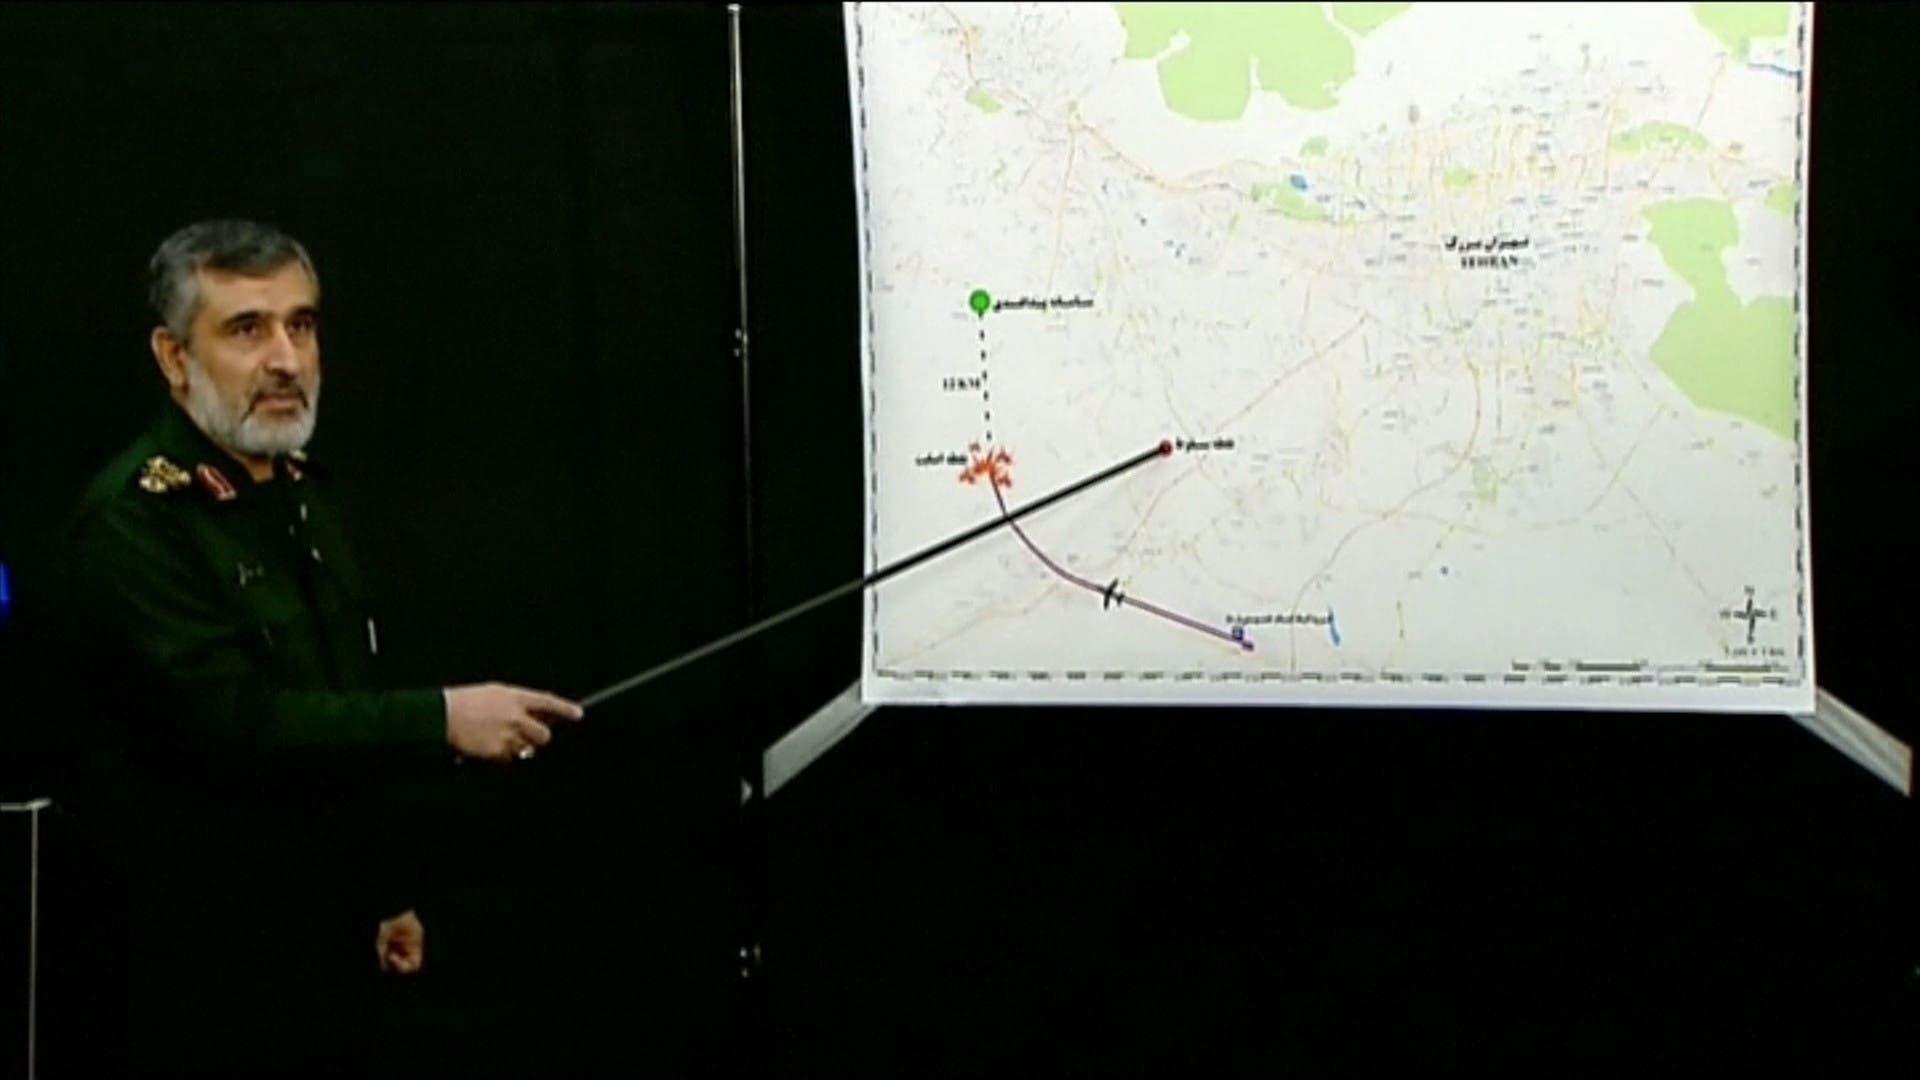 In an address broadcast by state TV on Saturday, Gen. Amir Ali Hajizadeh screen grab